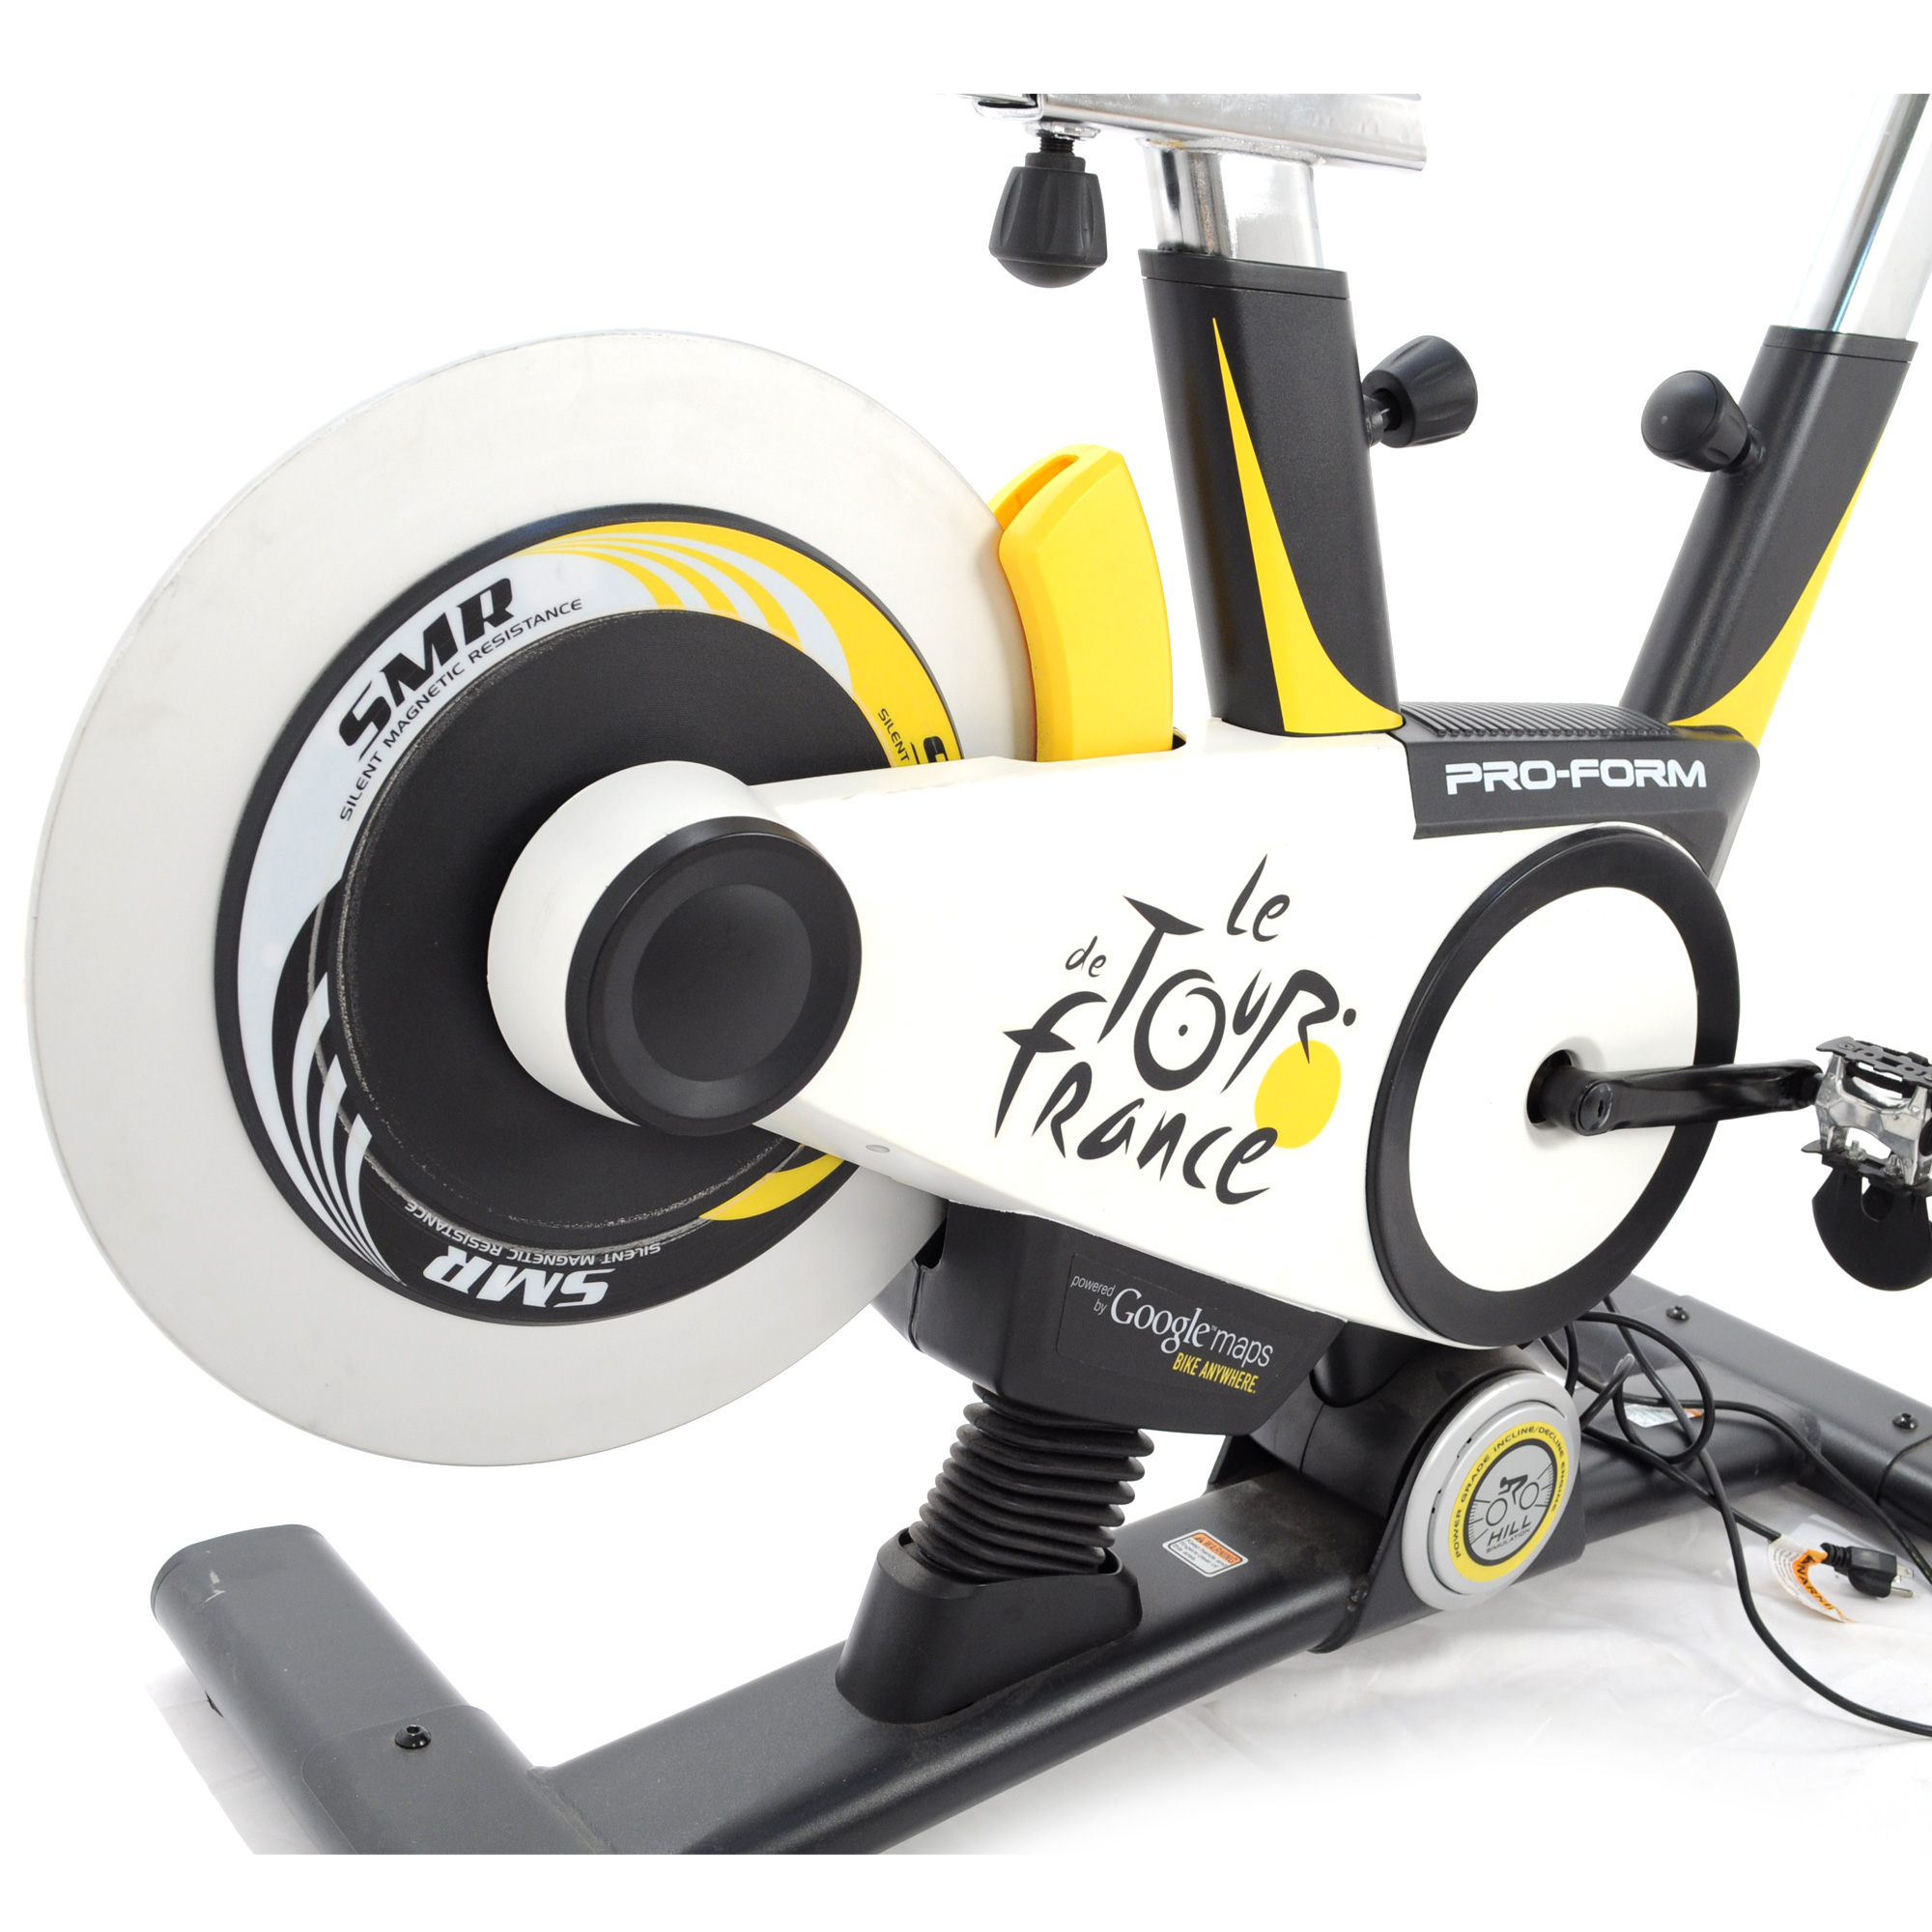 PRO-FORM Le Tour De France Stationary Spin Bike